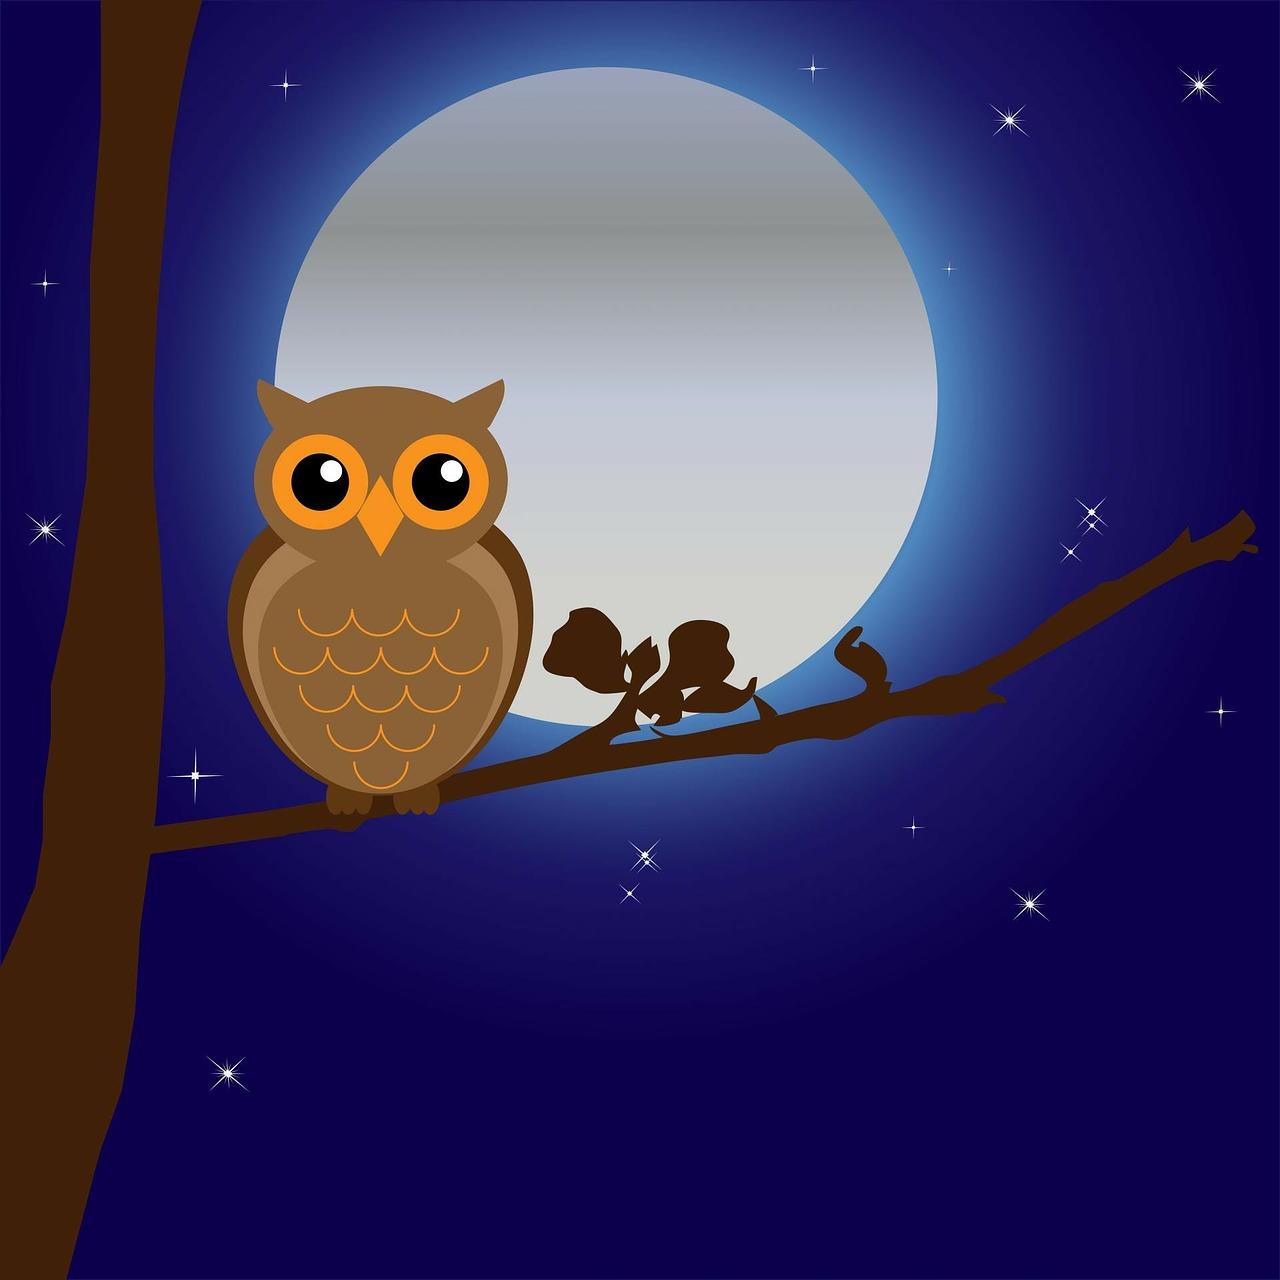 owl-163574_1280